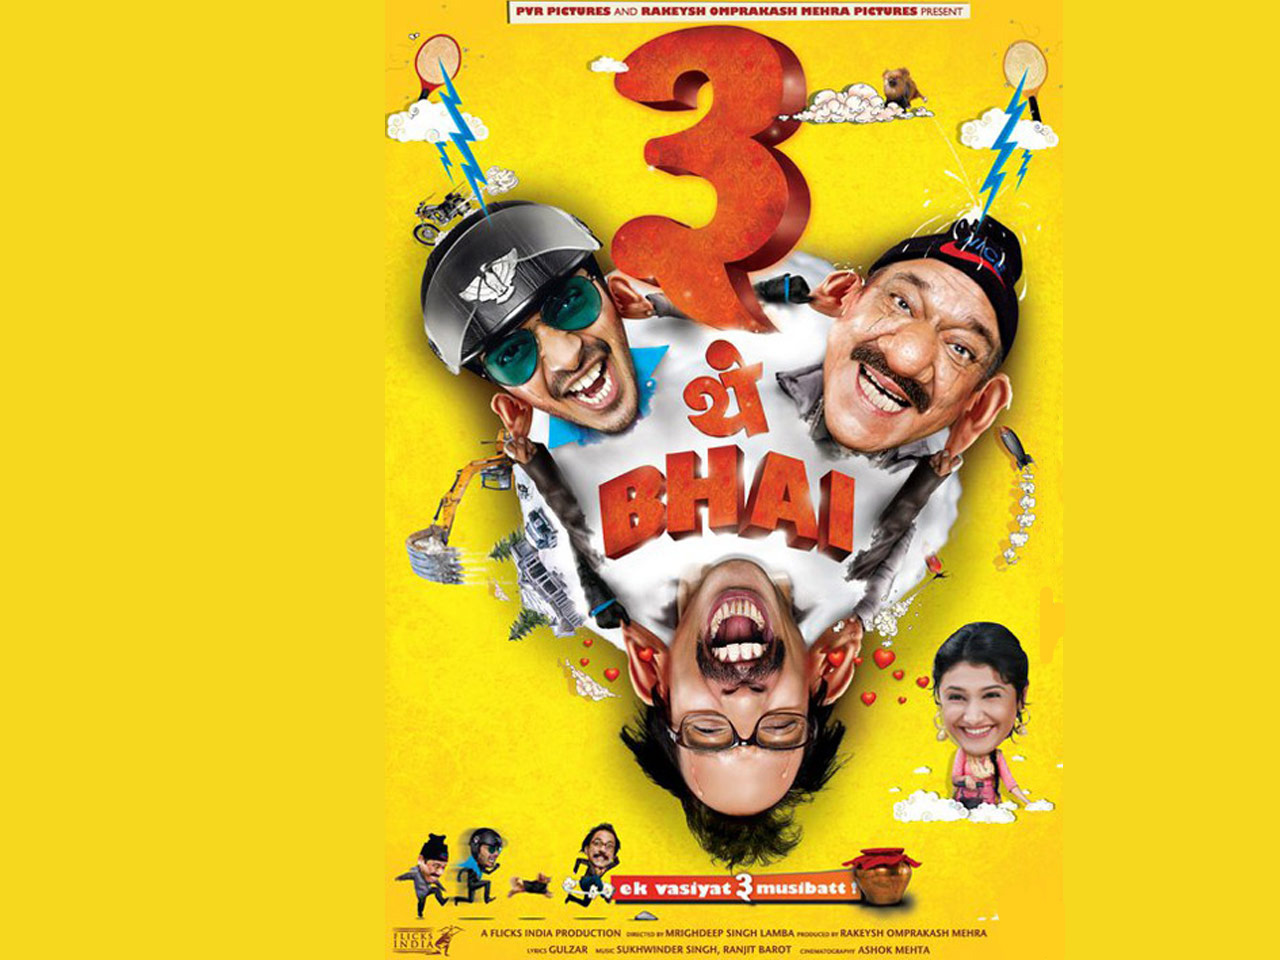 http://2.bp.blogspot.com/-sDWVQ3_17pA/TdOVa_PFUaI/AAAAAAAAGmQ/OtrWTpm-Mqc/s1600/TEEN-THAY-BHAI-2011-Hindi-Movie.jpg